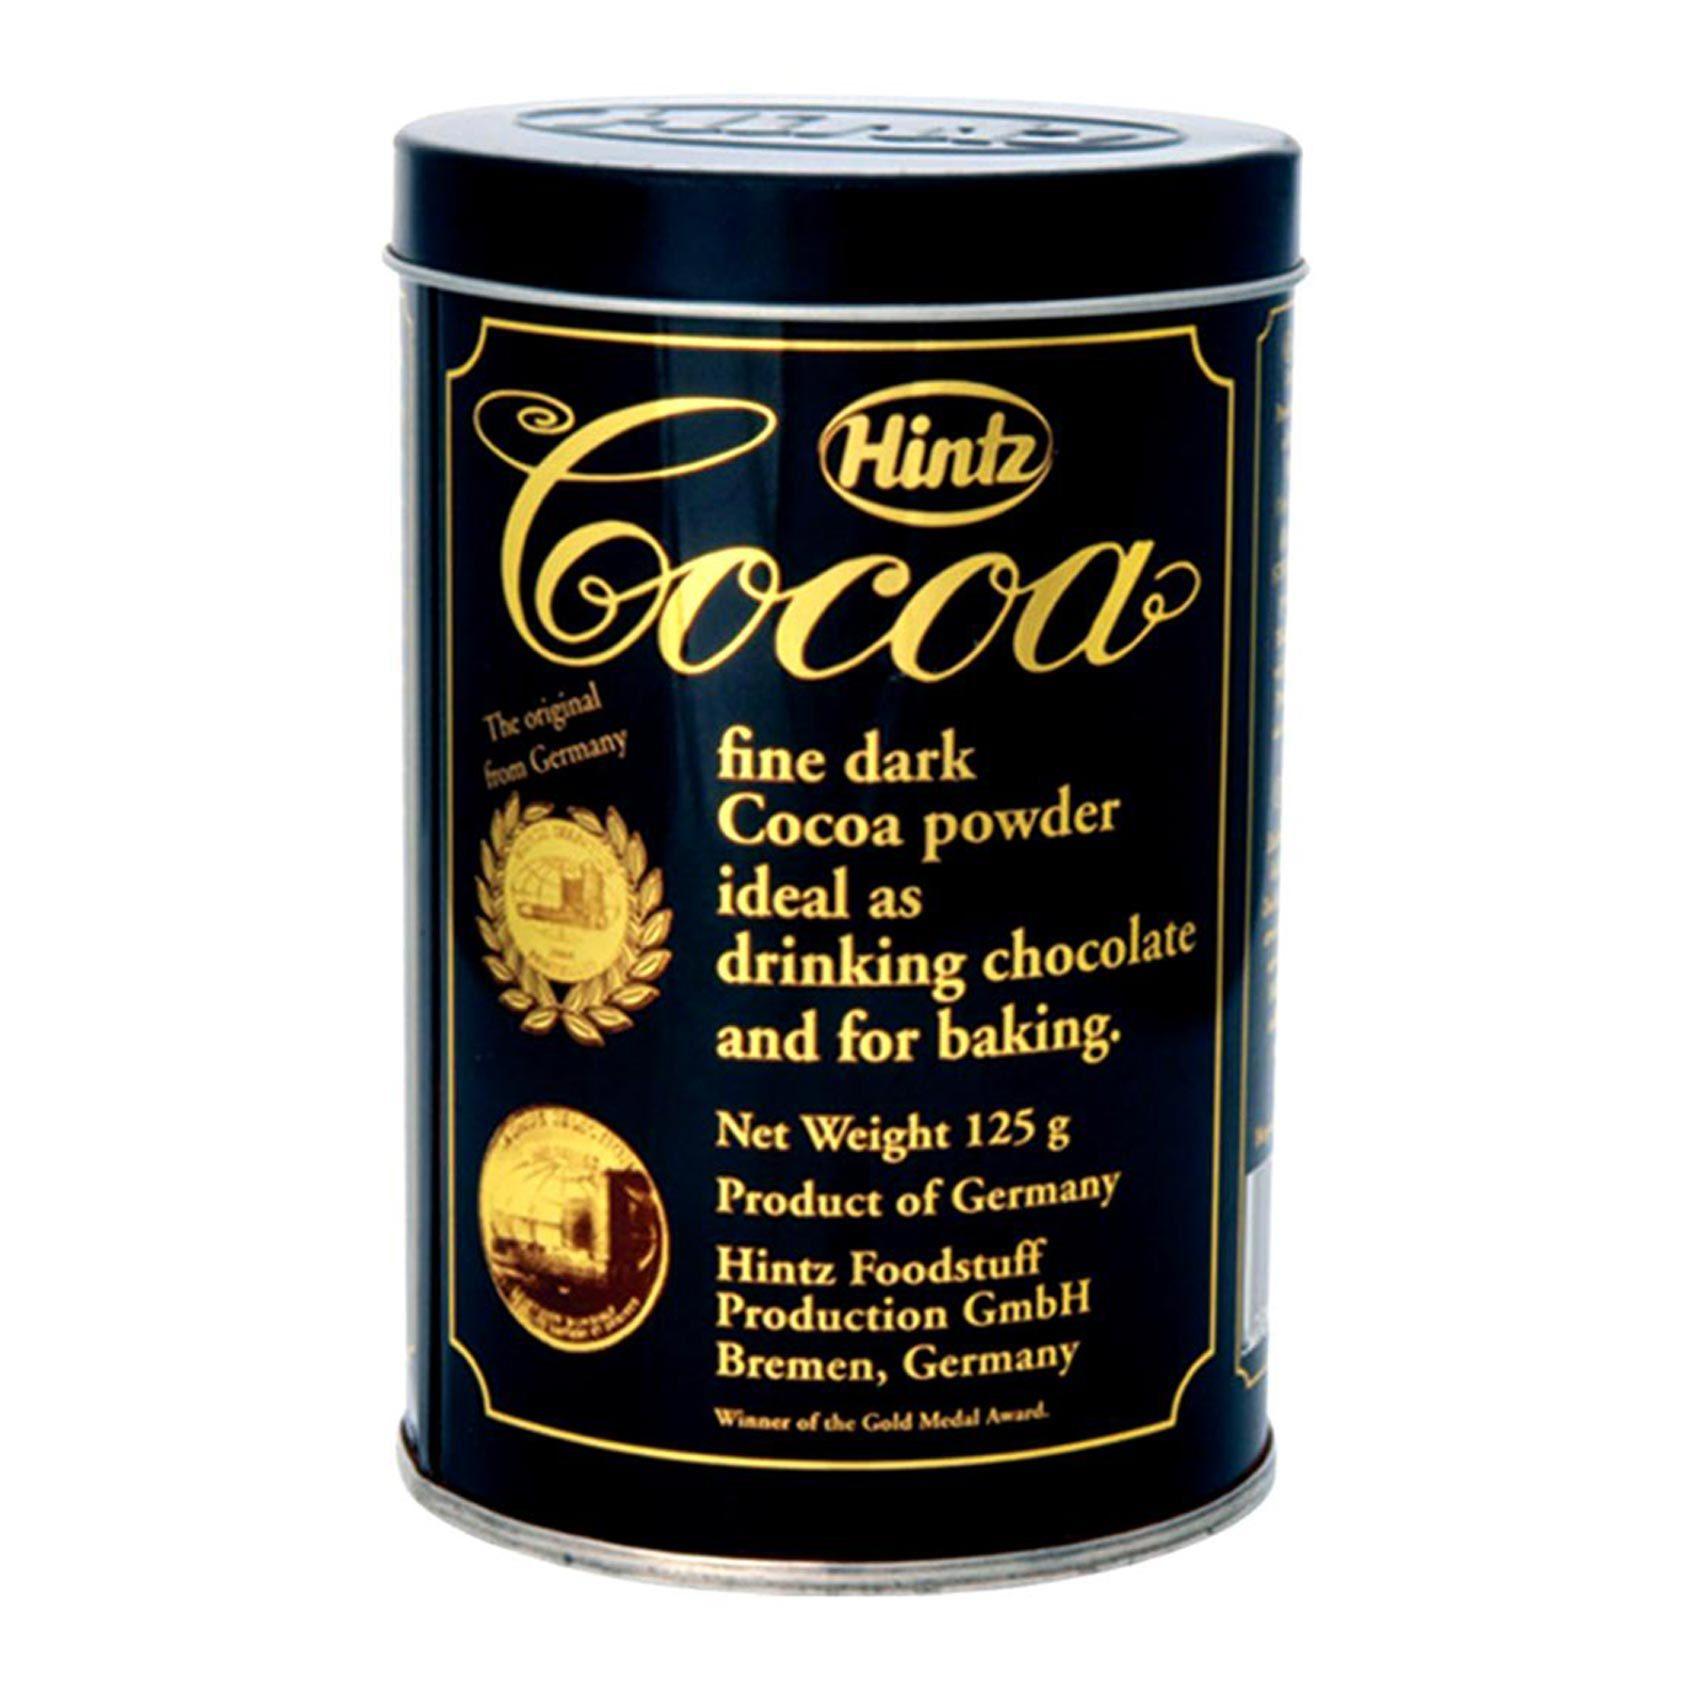 Buy Hintz Fine Dark Cocoa Powder 125 G Online Shop Food Cupboard On Carrefour Saudi Arabia